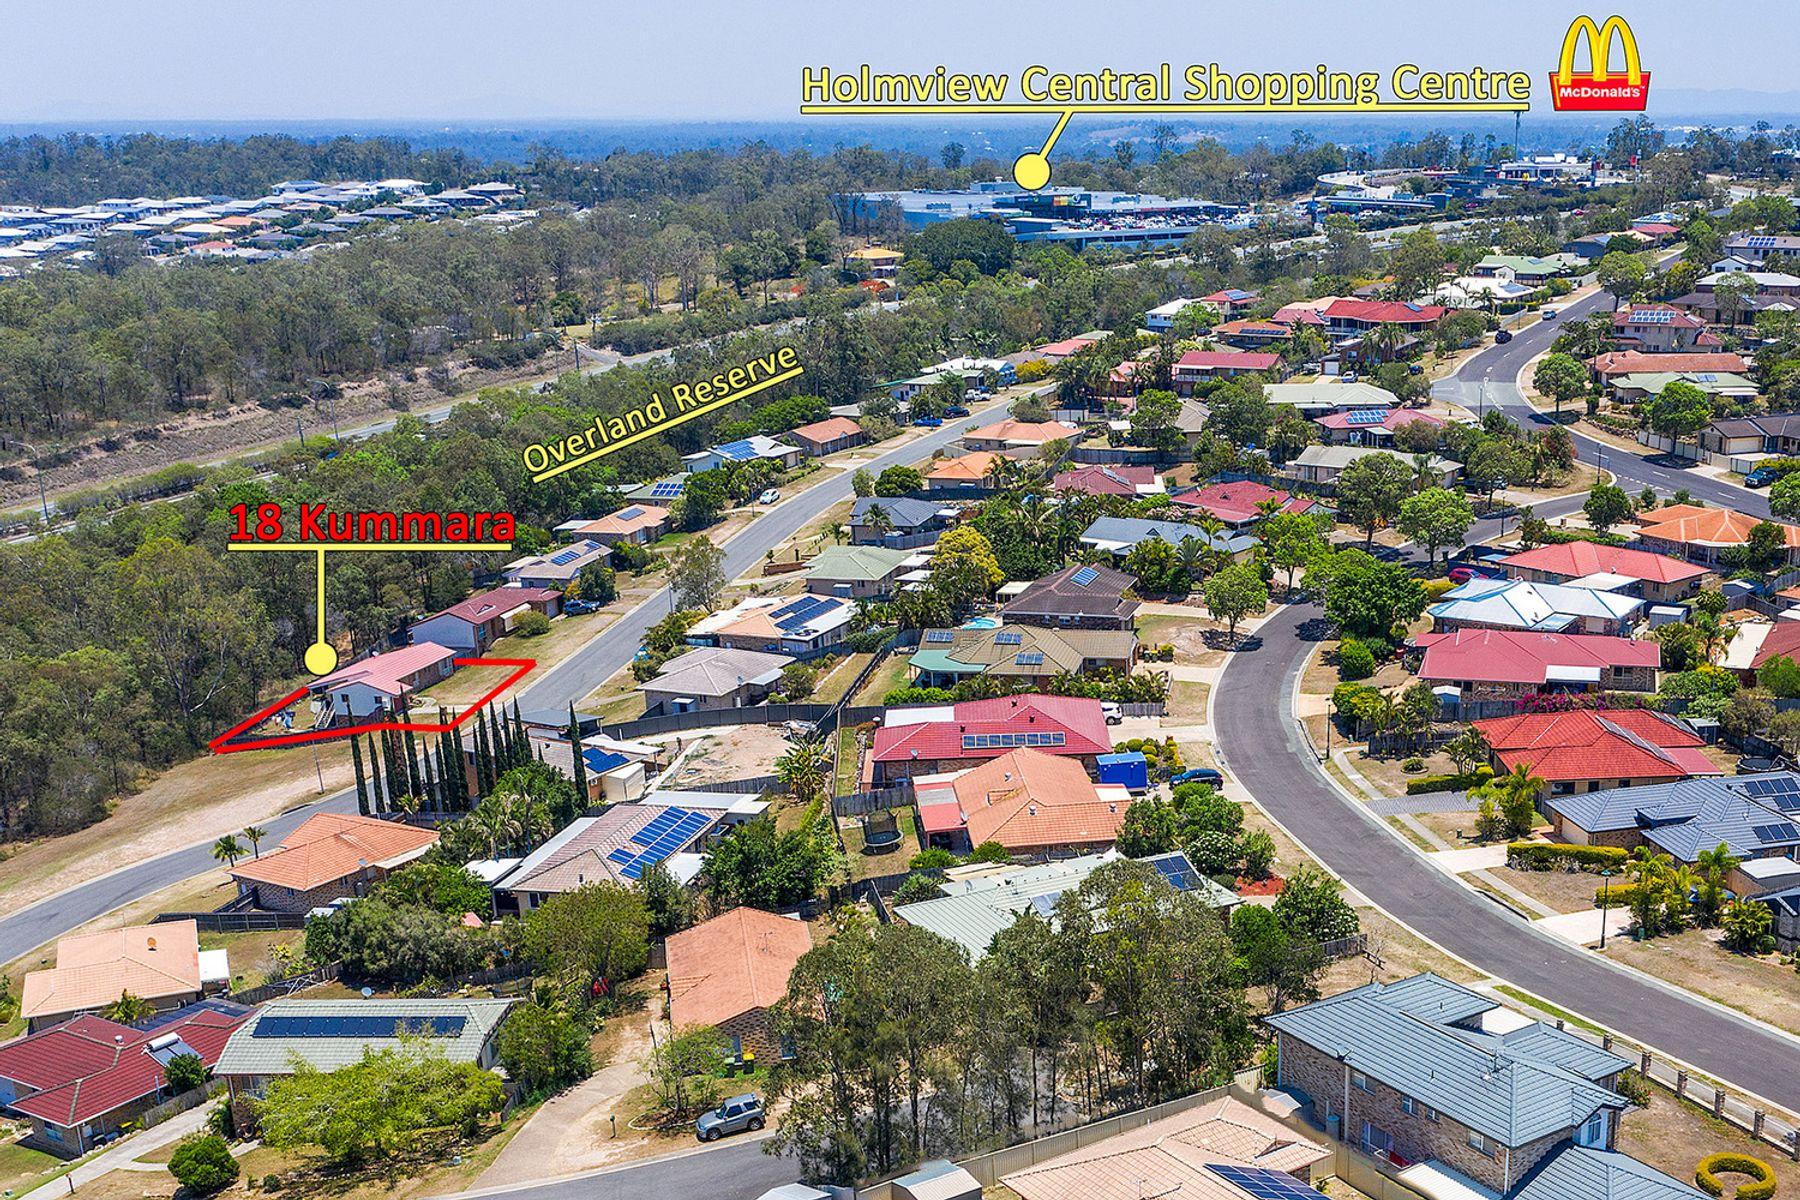 18 Kummara Street, Edens Landing, QLD 4207